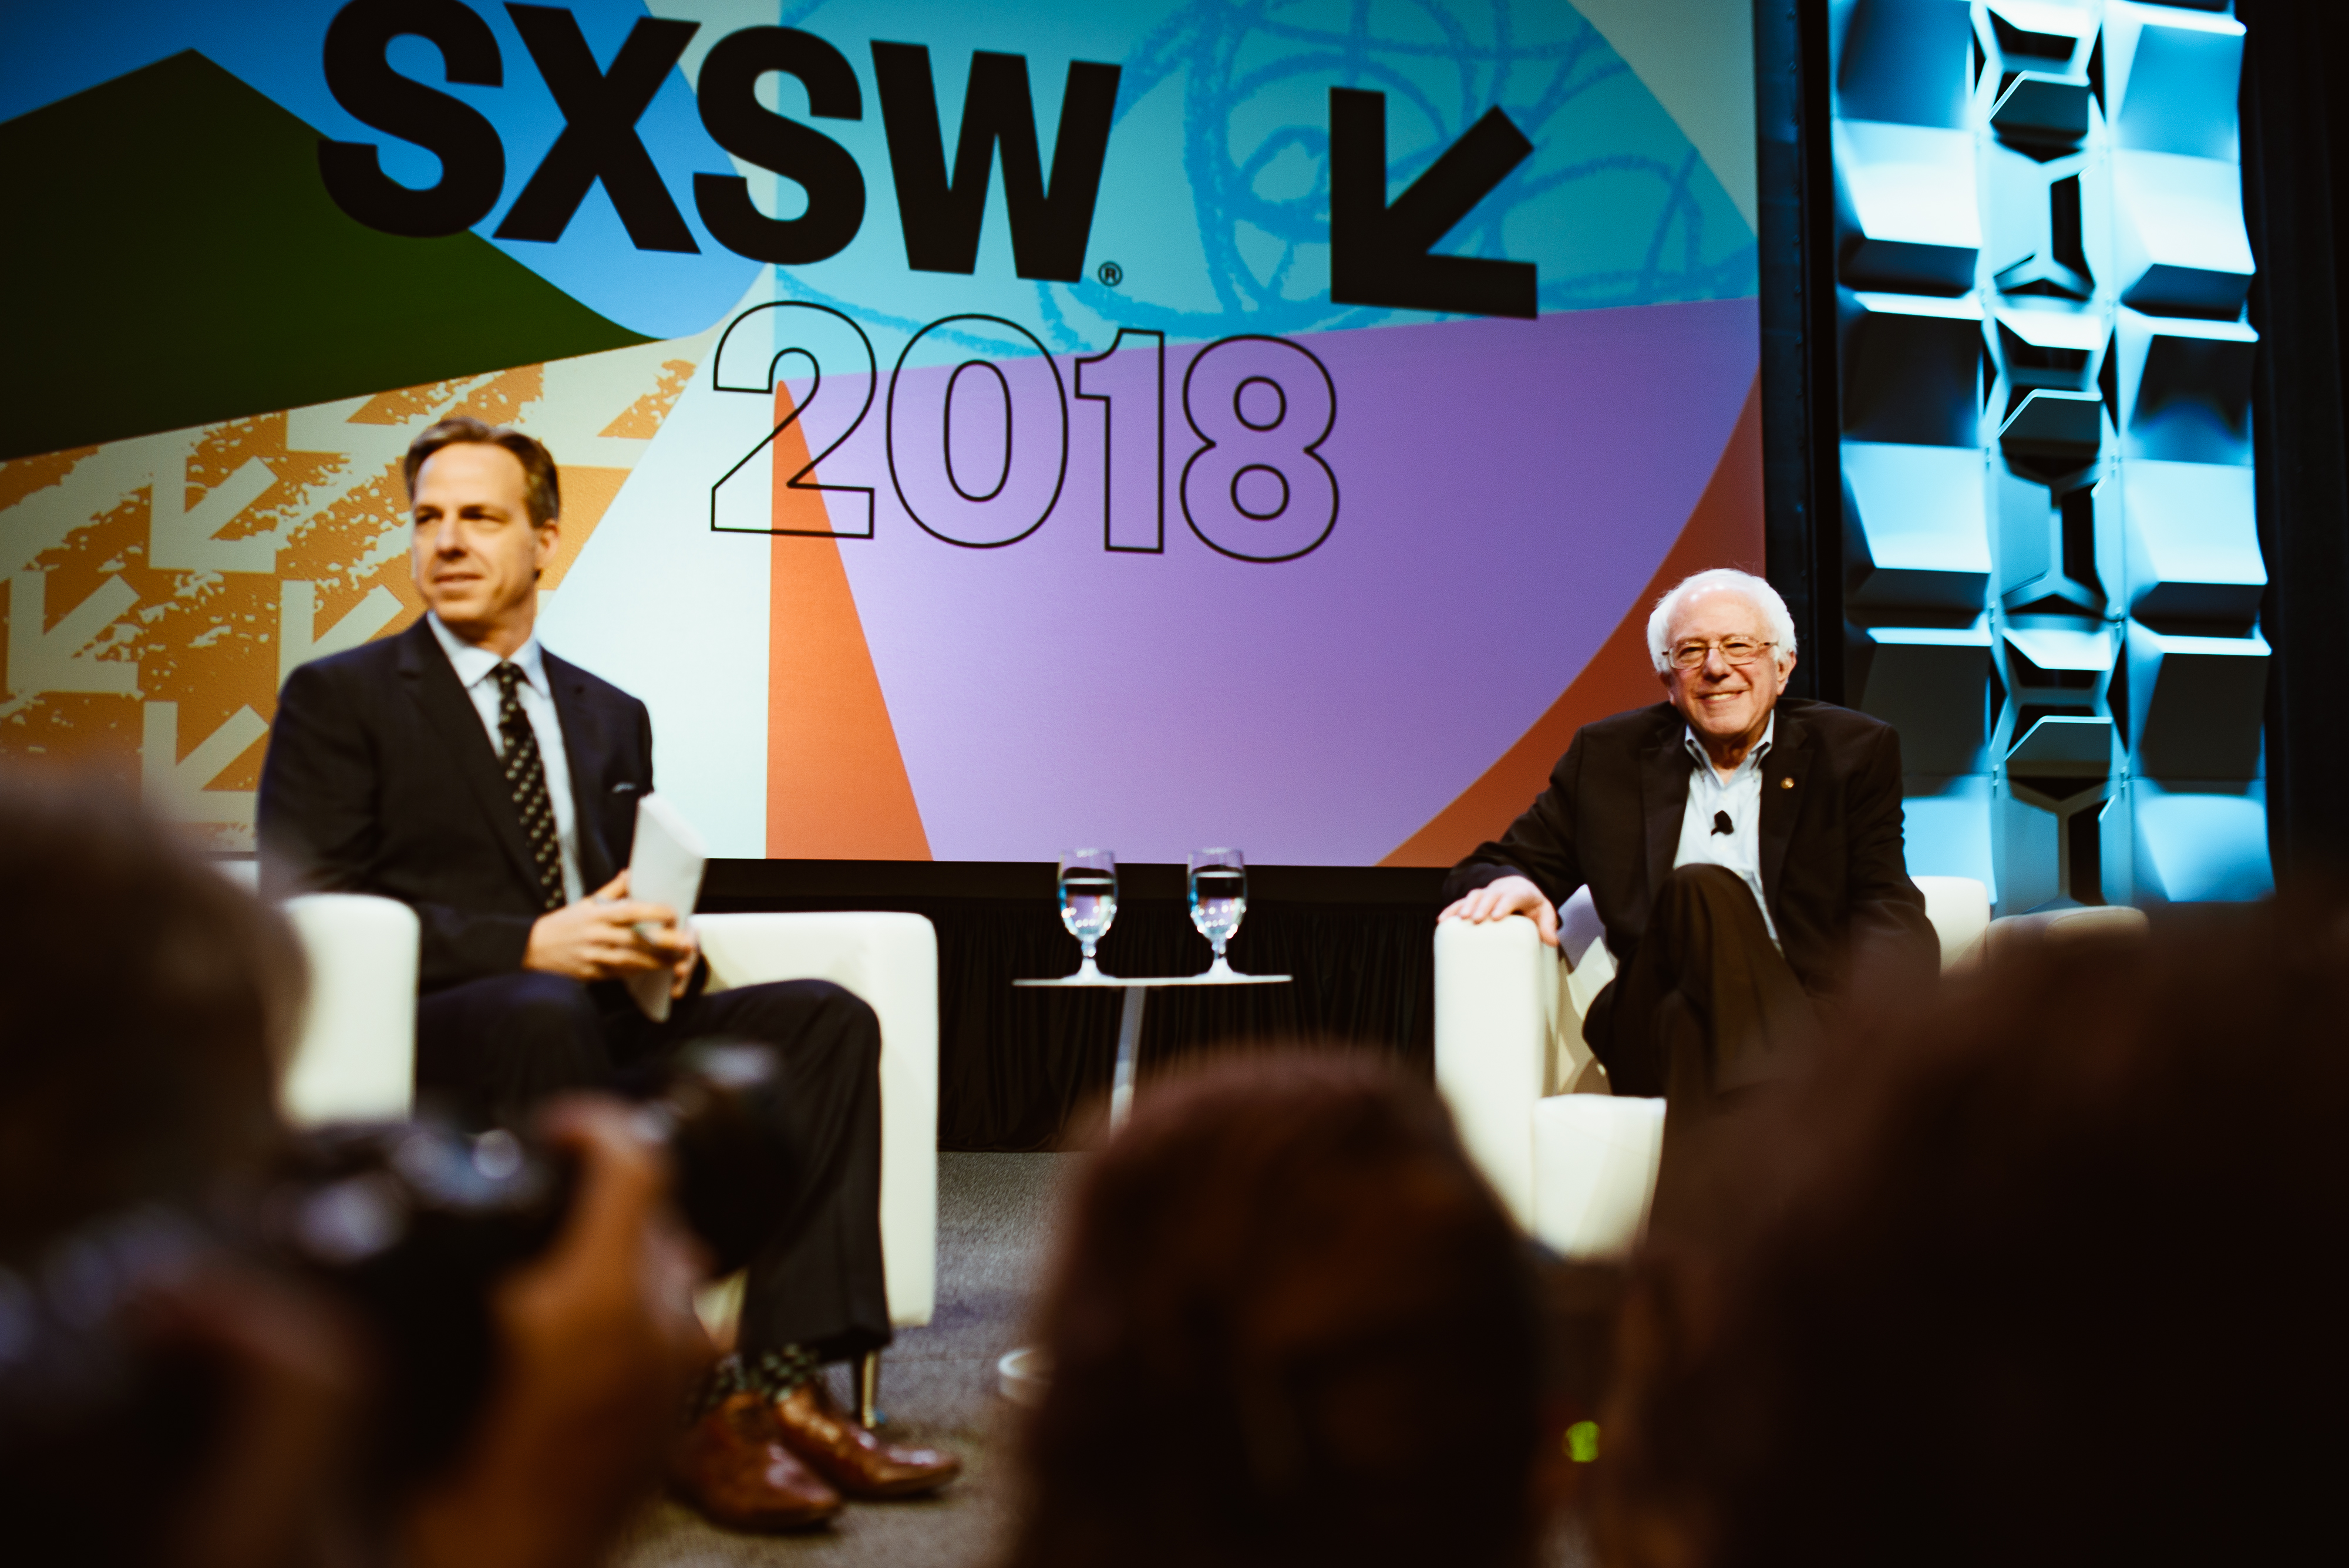 Jake Tapper and Bernie Sanders | Photo by Judy Won